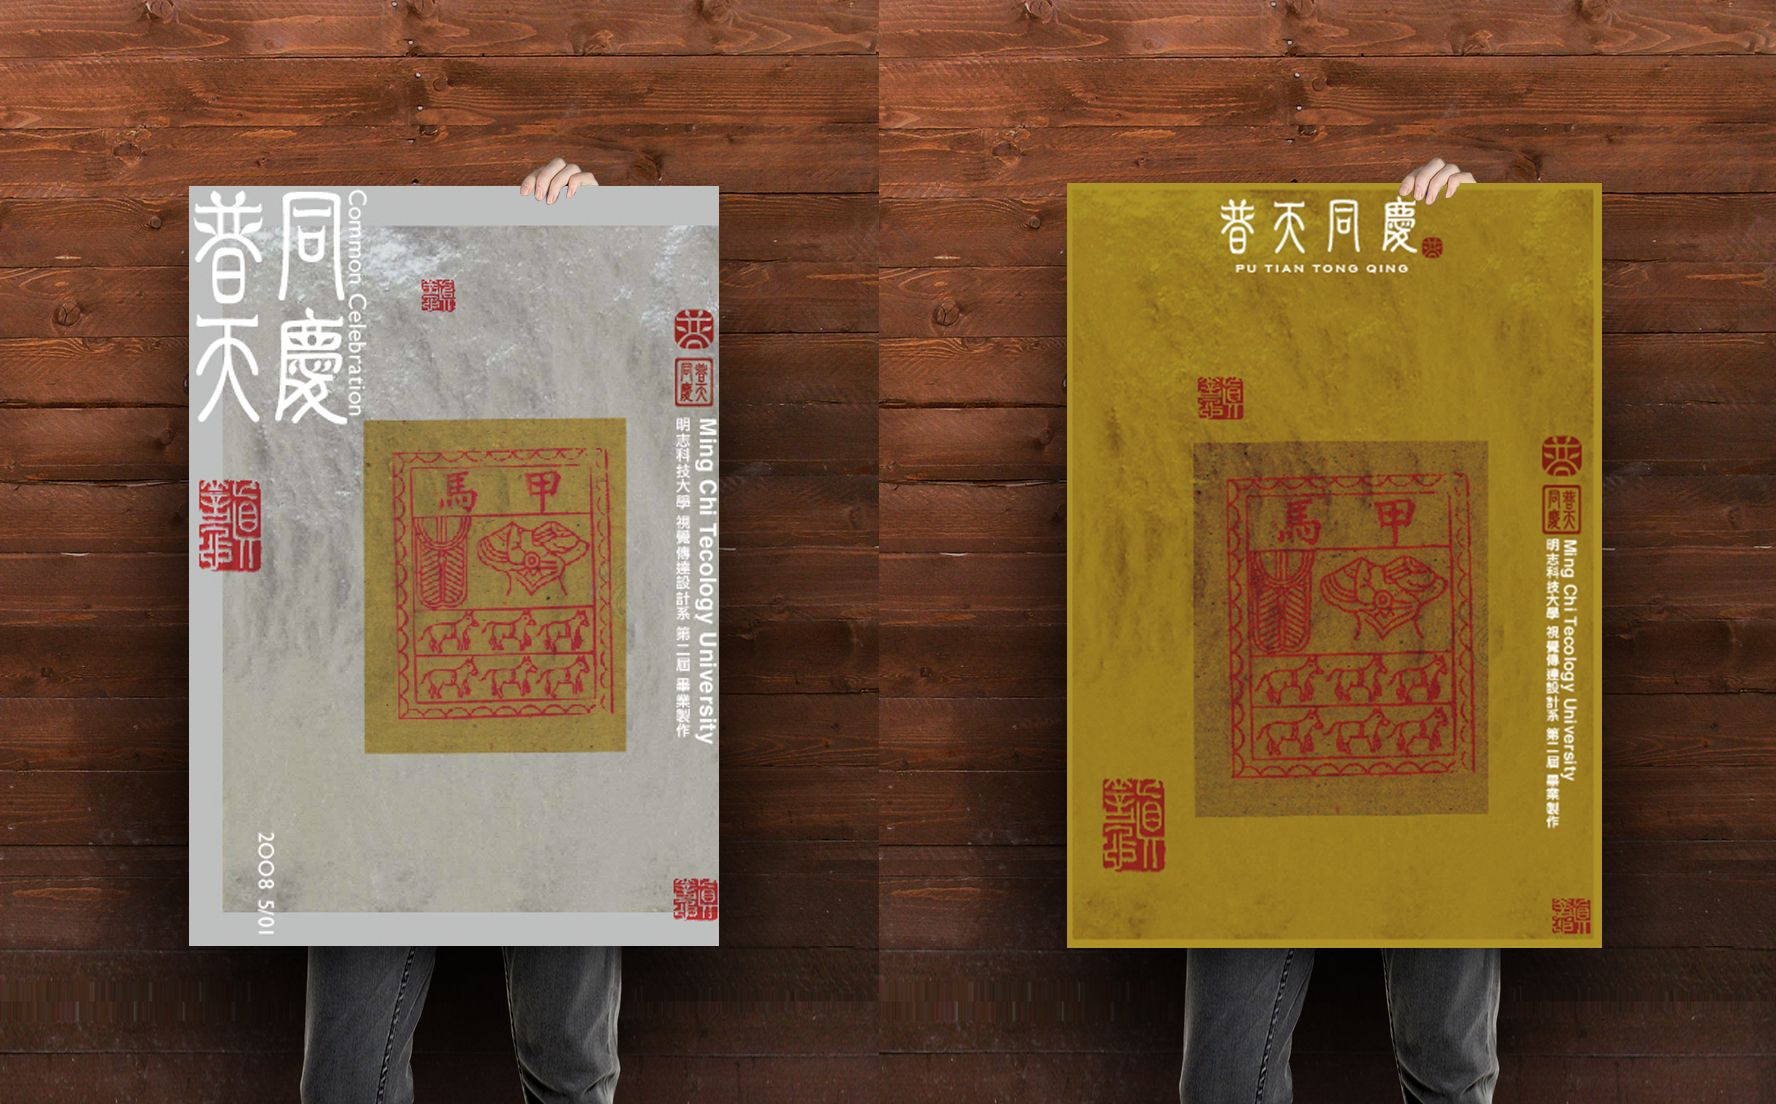 PU TIAN TONG QING 普天同慶 poster